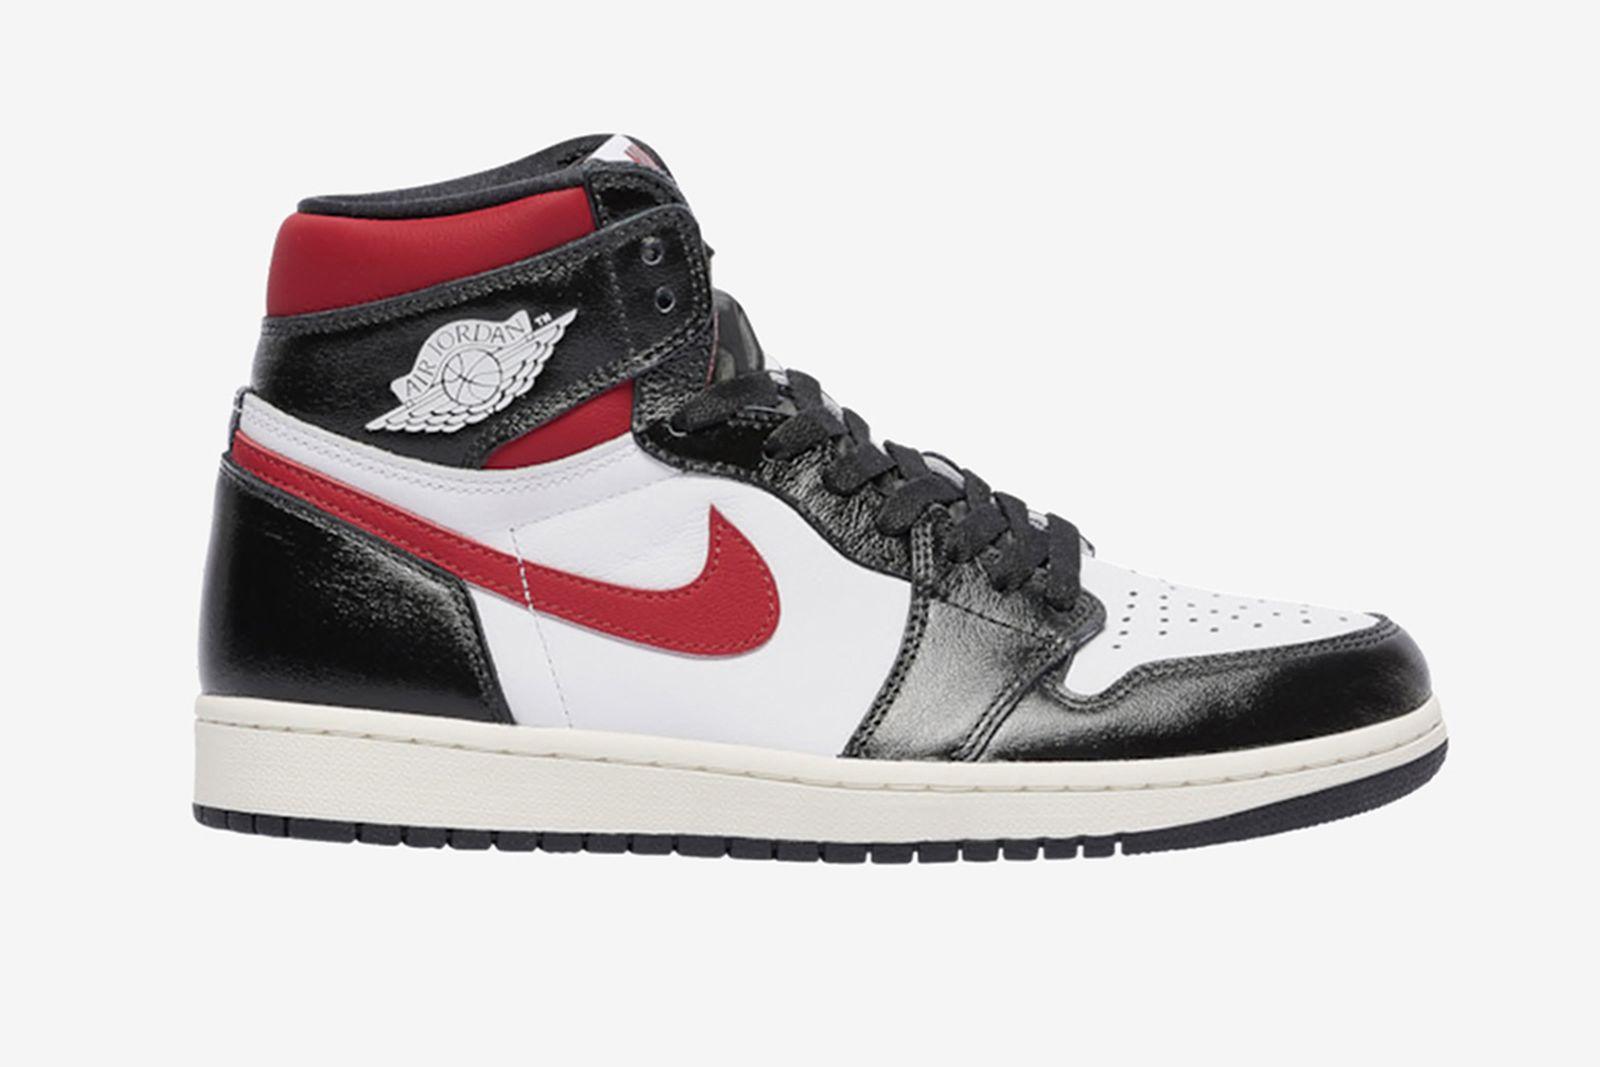 jordans foot locker main Nike